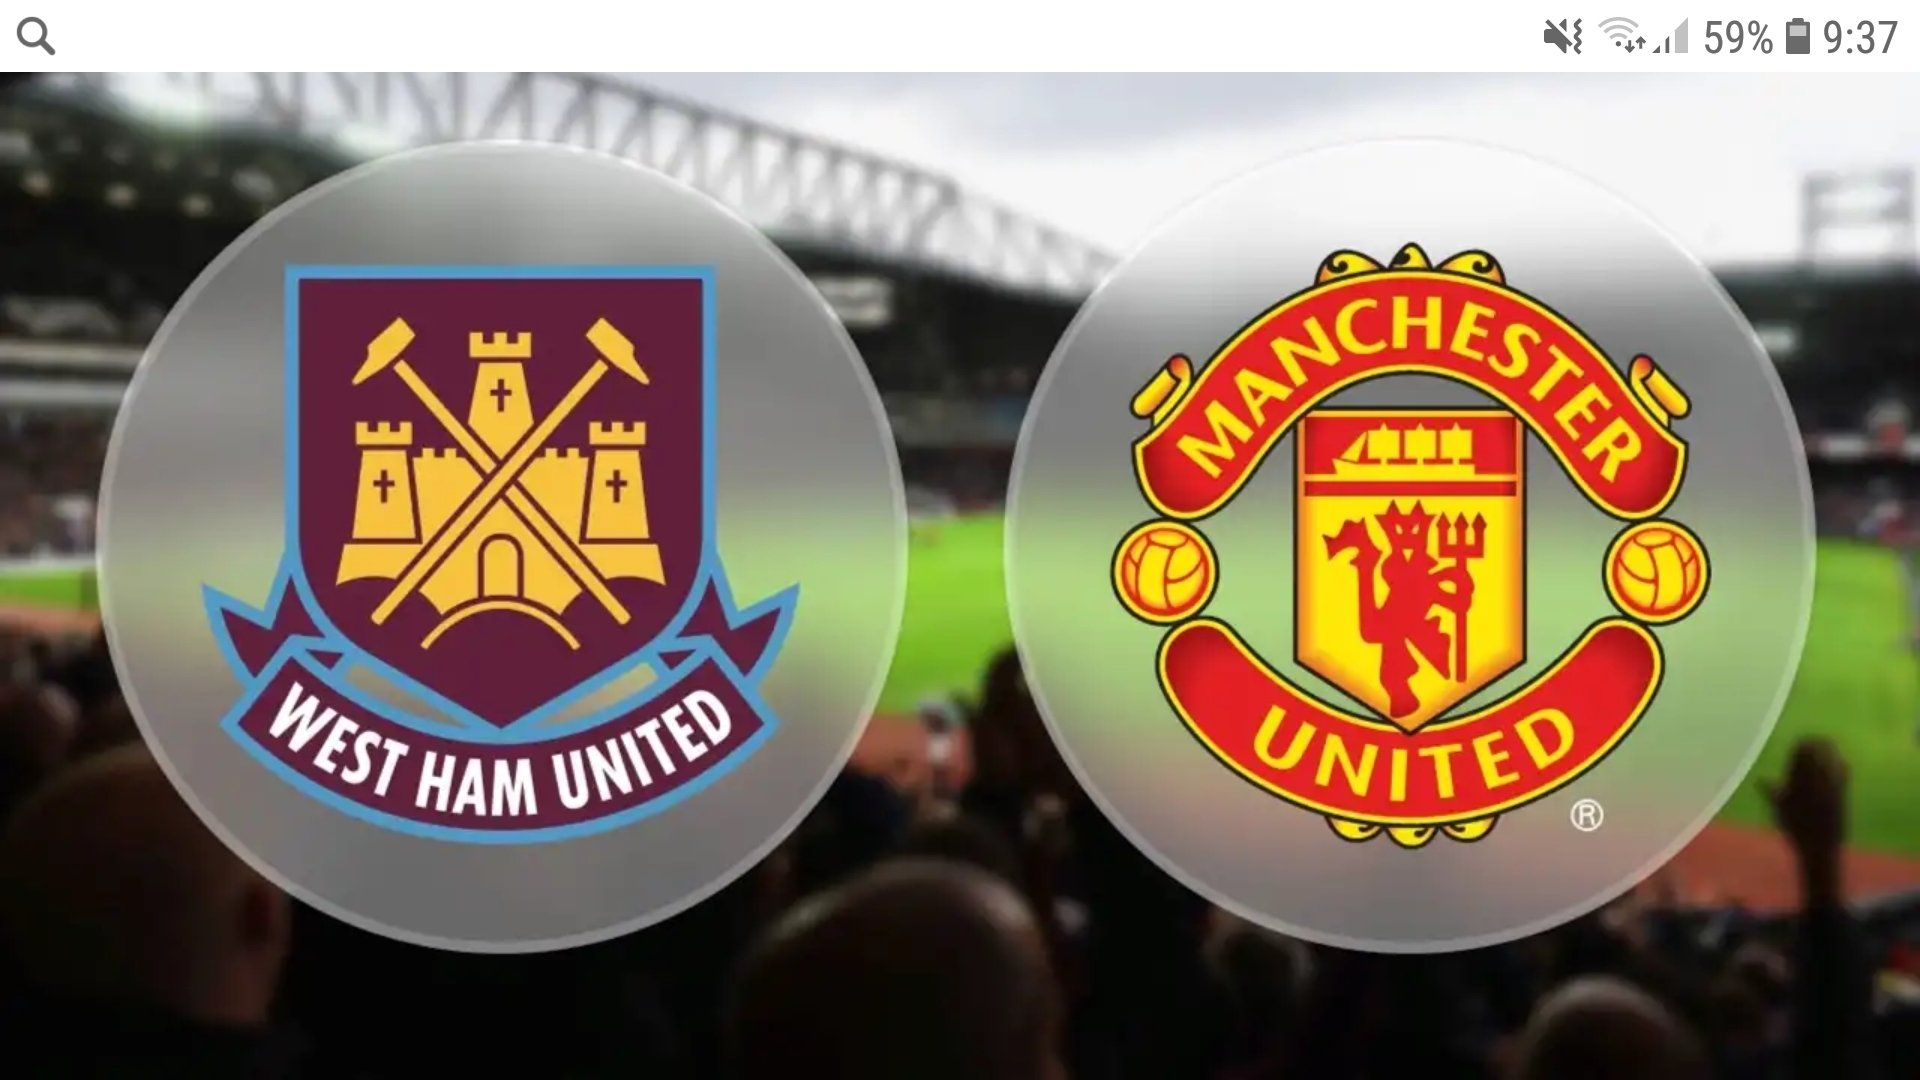 Вест Хэм – Манчестер Юнайтед. Прогноз матча чемпионата Англии